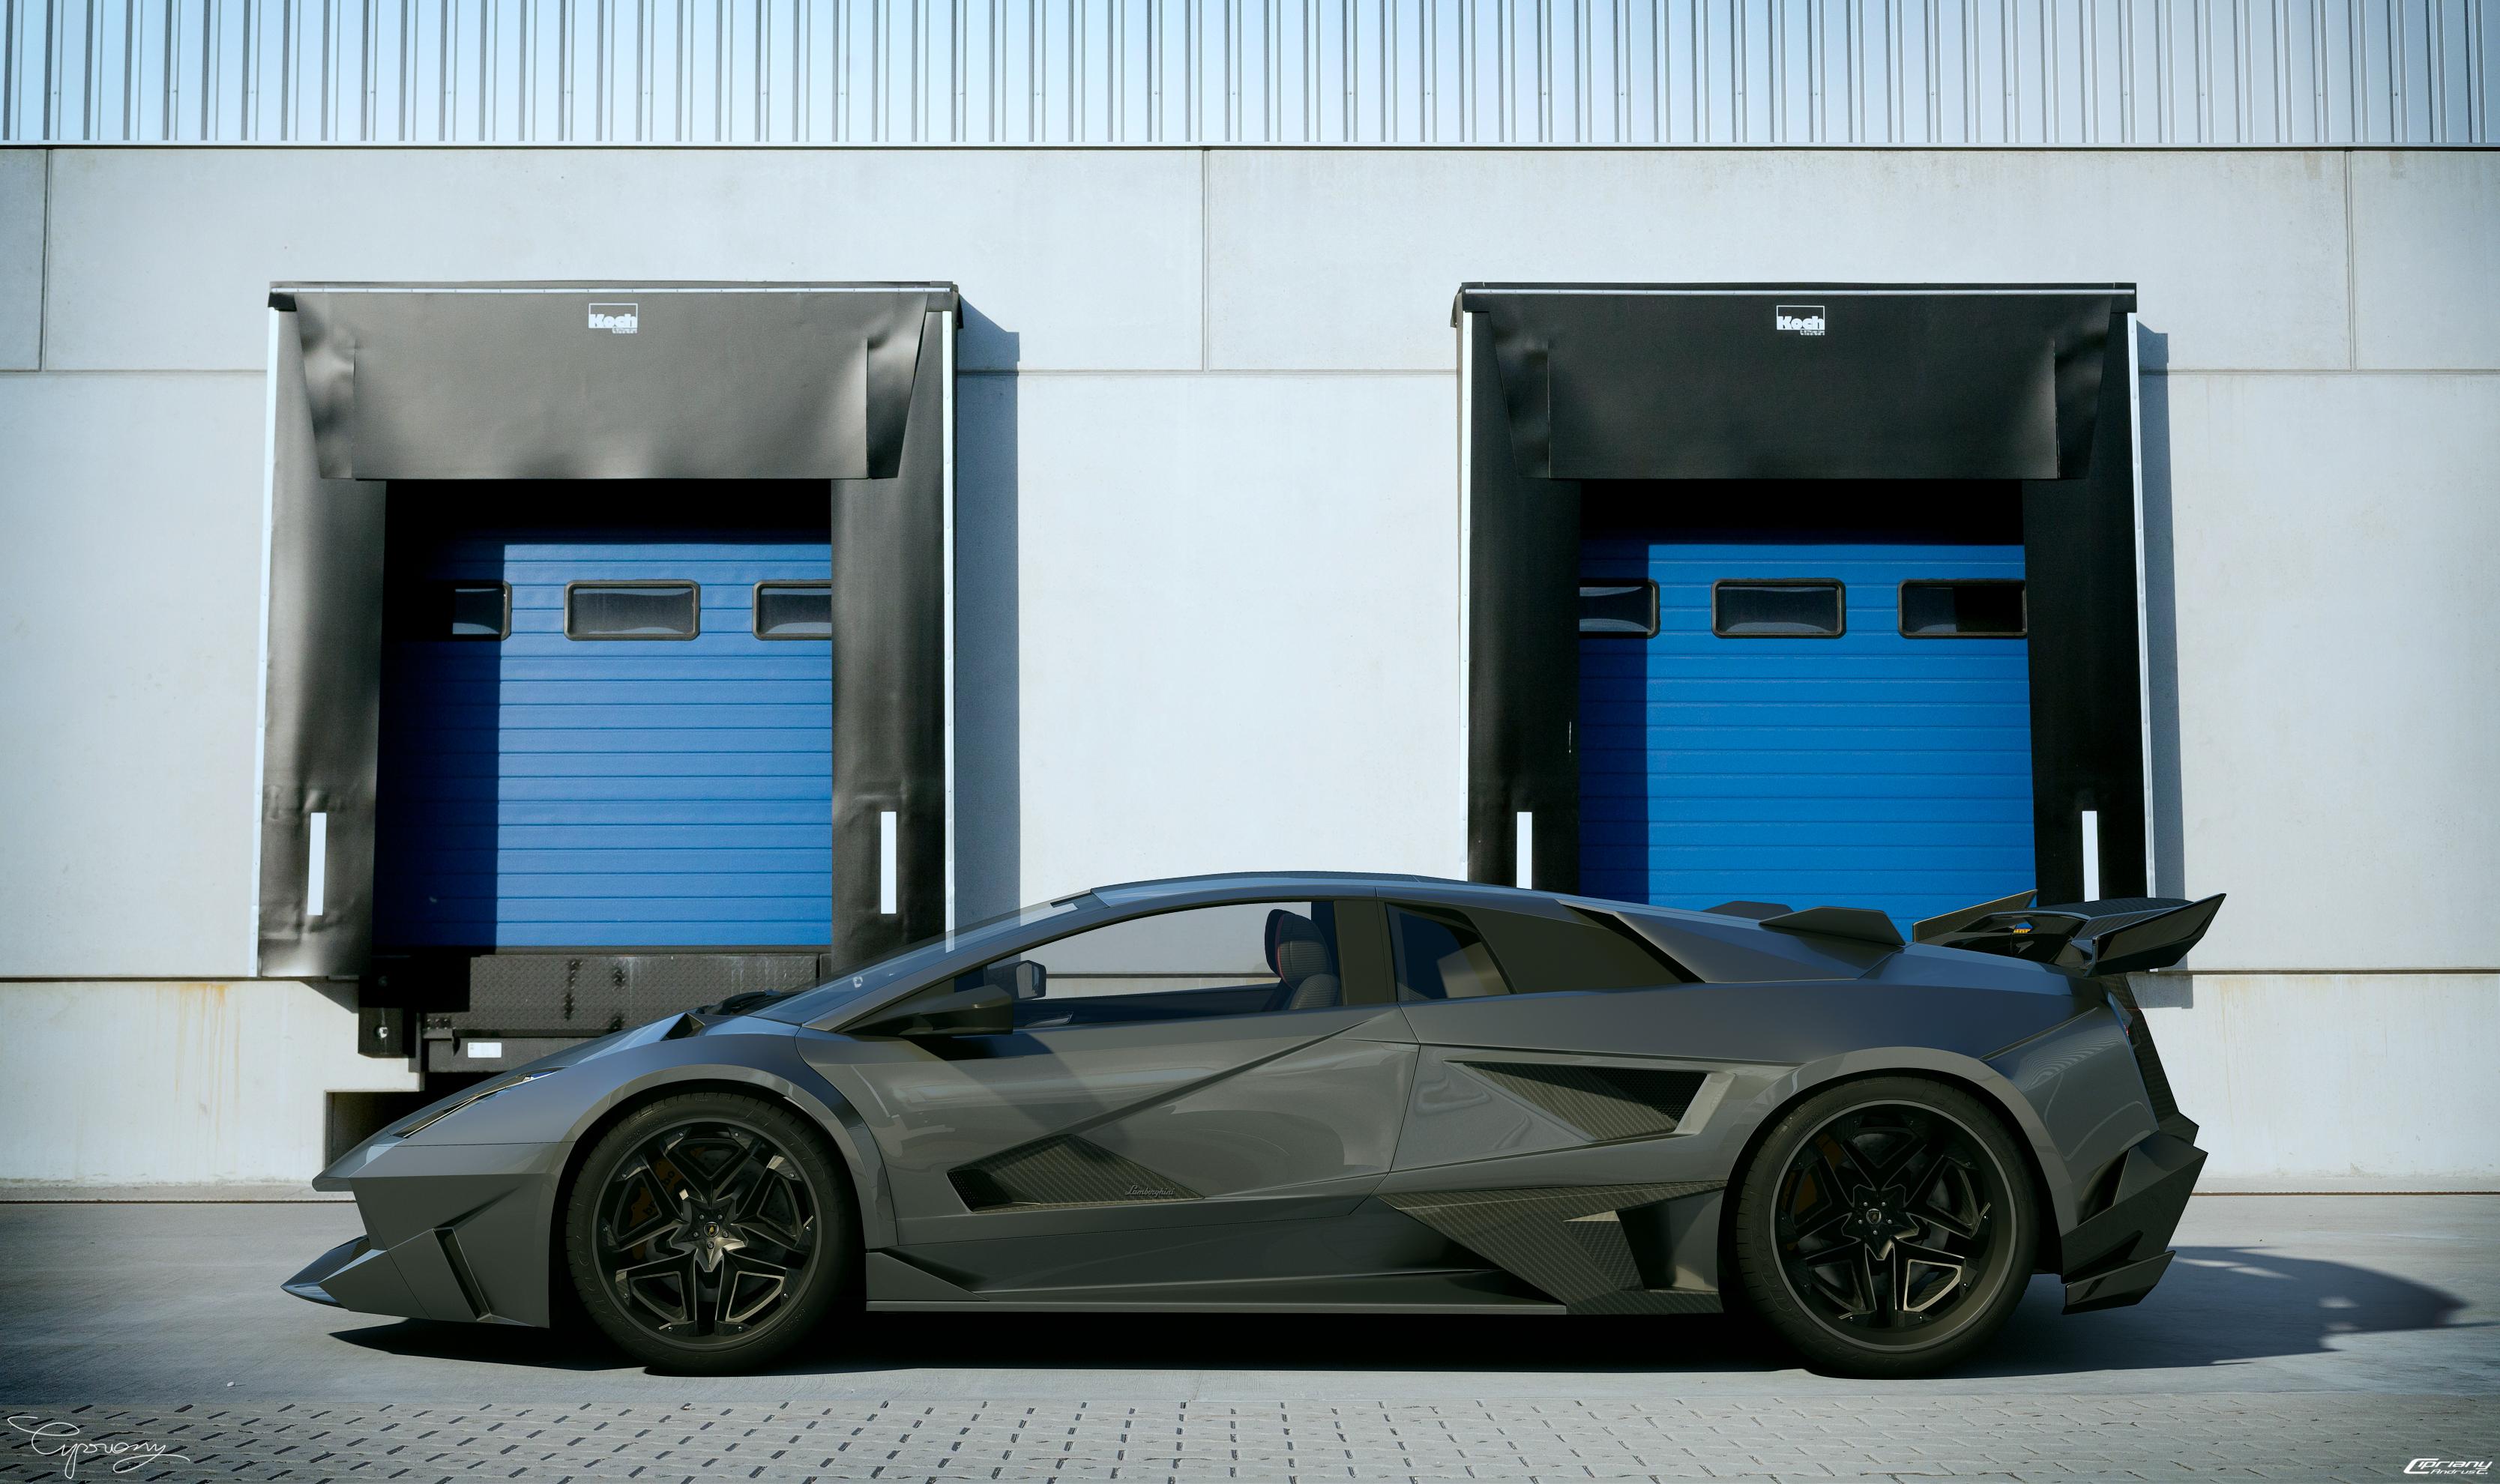 Lamborghini Murcielago Sv Tuning 3 By Cipriany On Deviantart